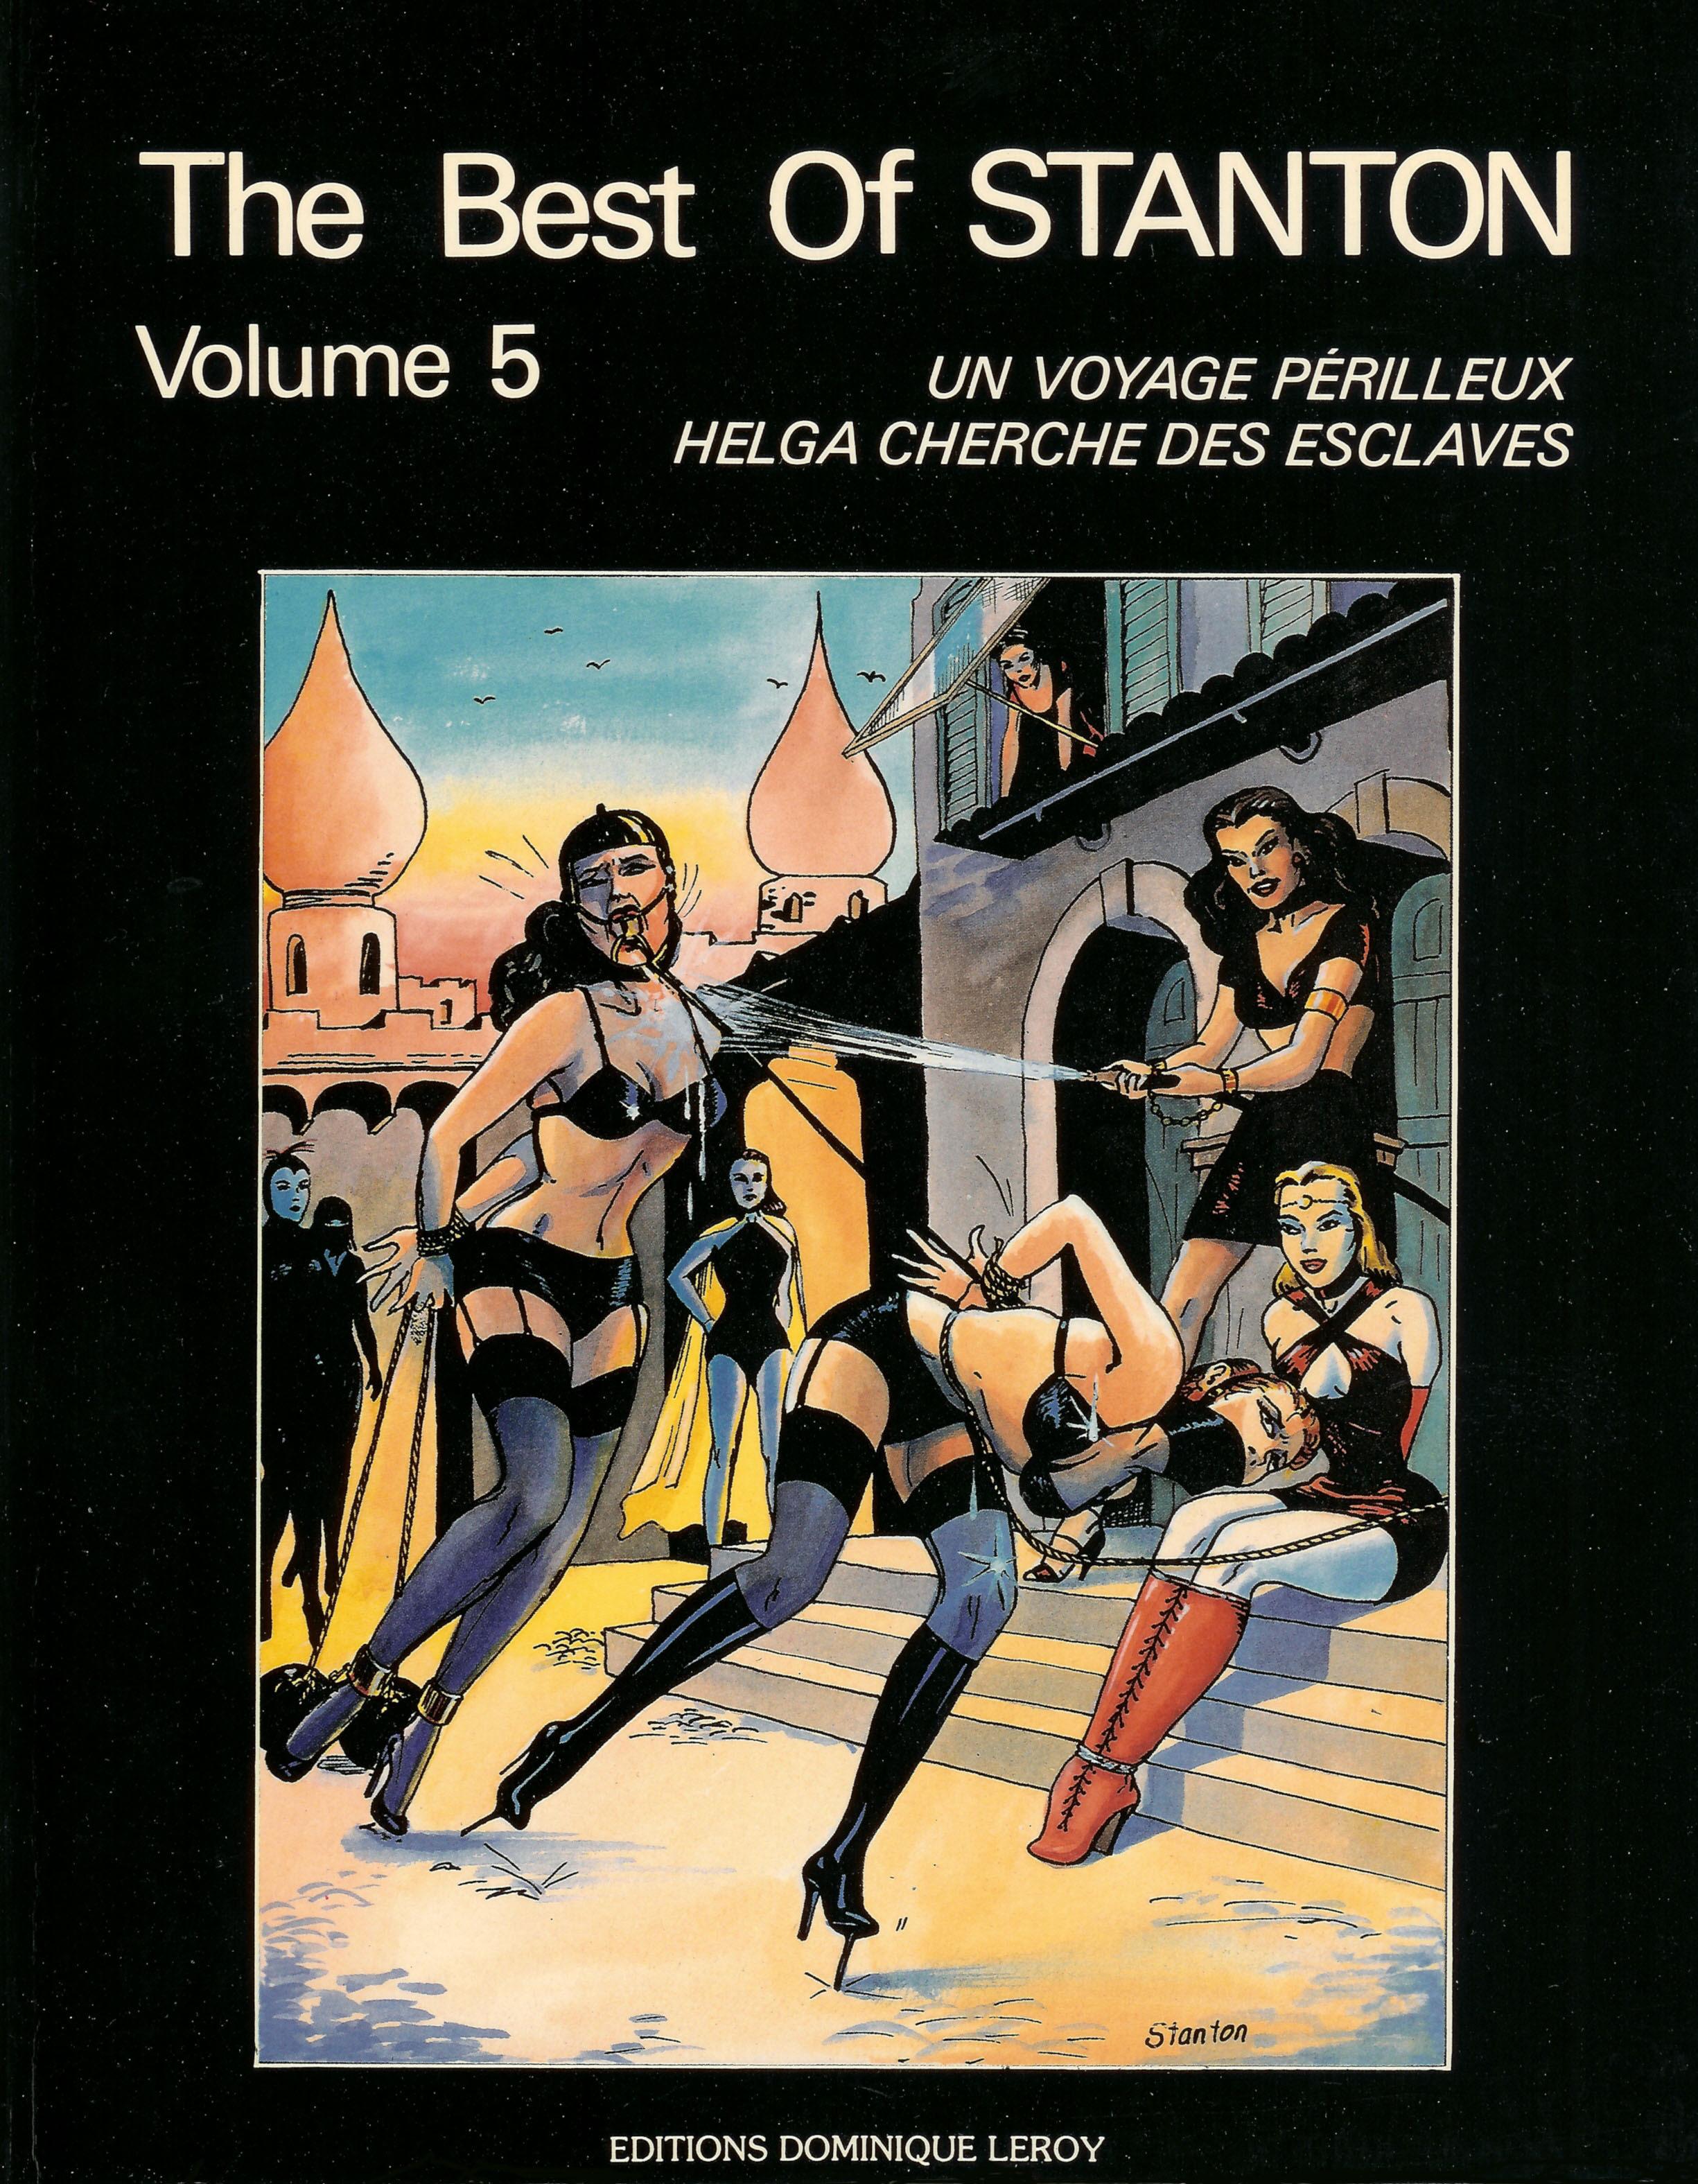 The Best Of Stanton volume 5